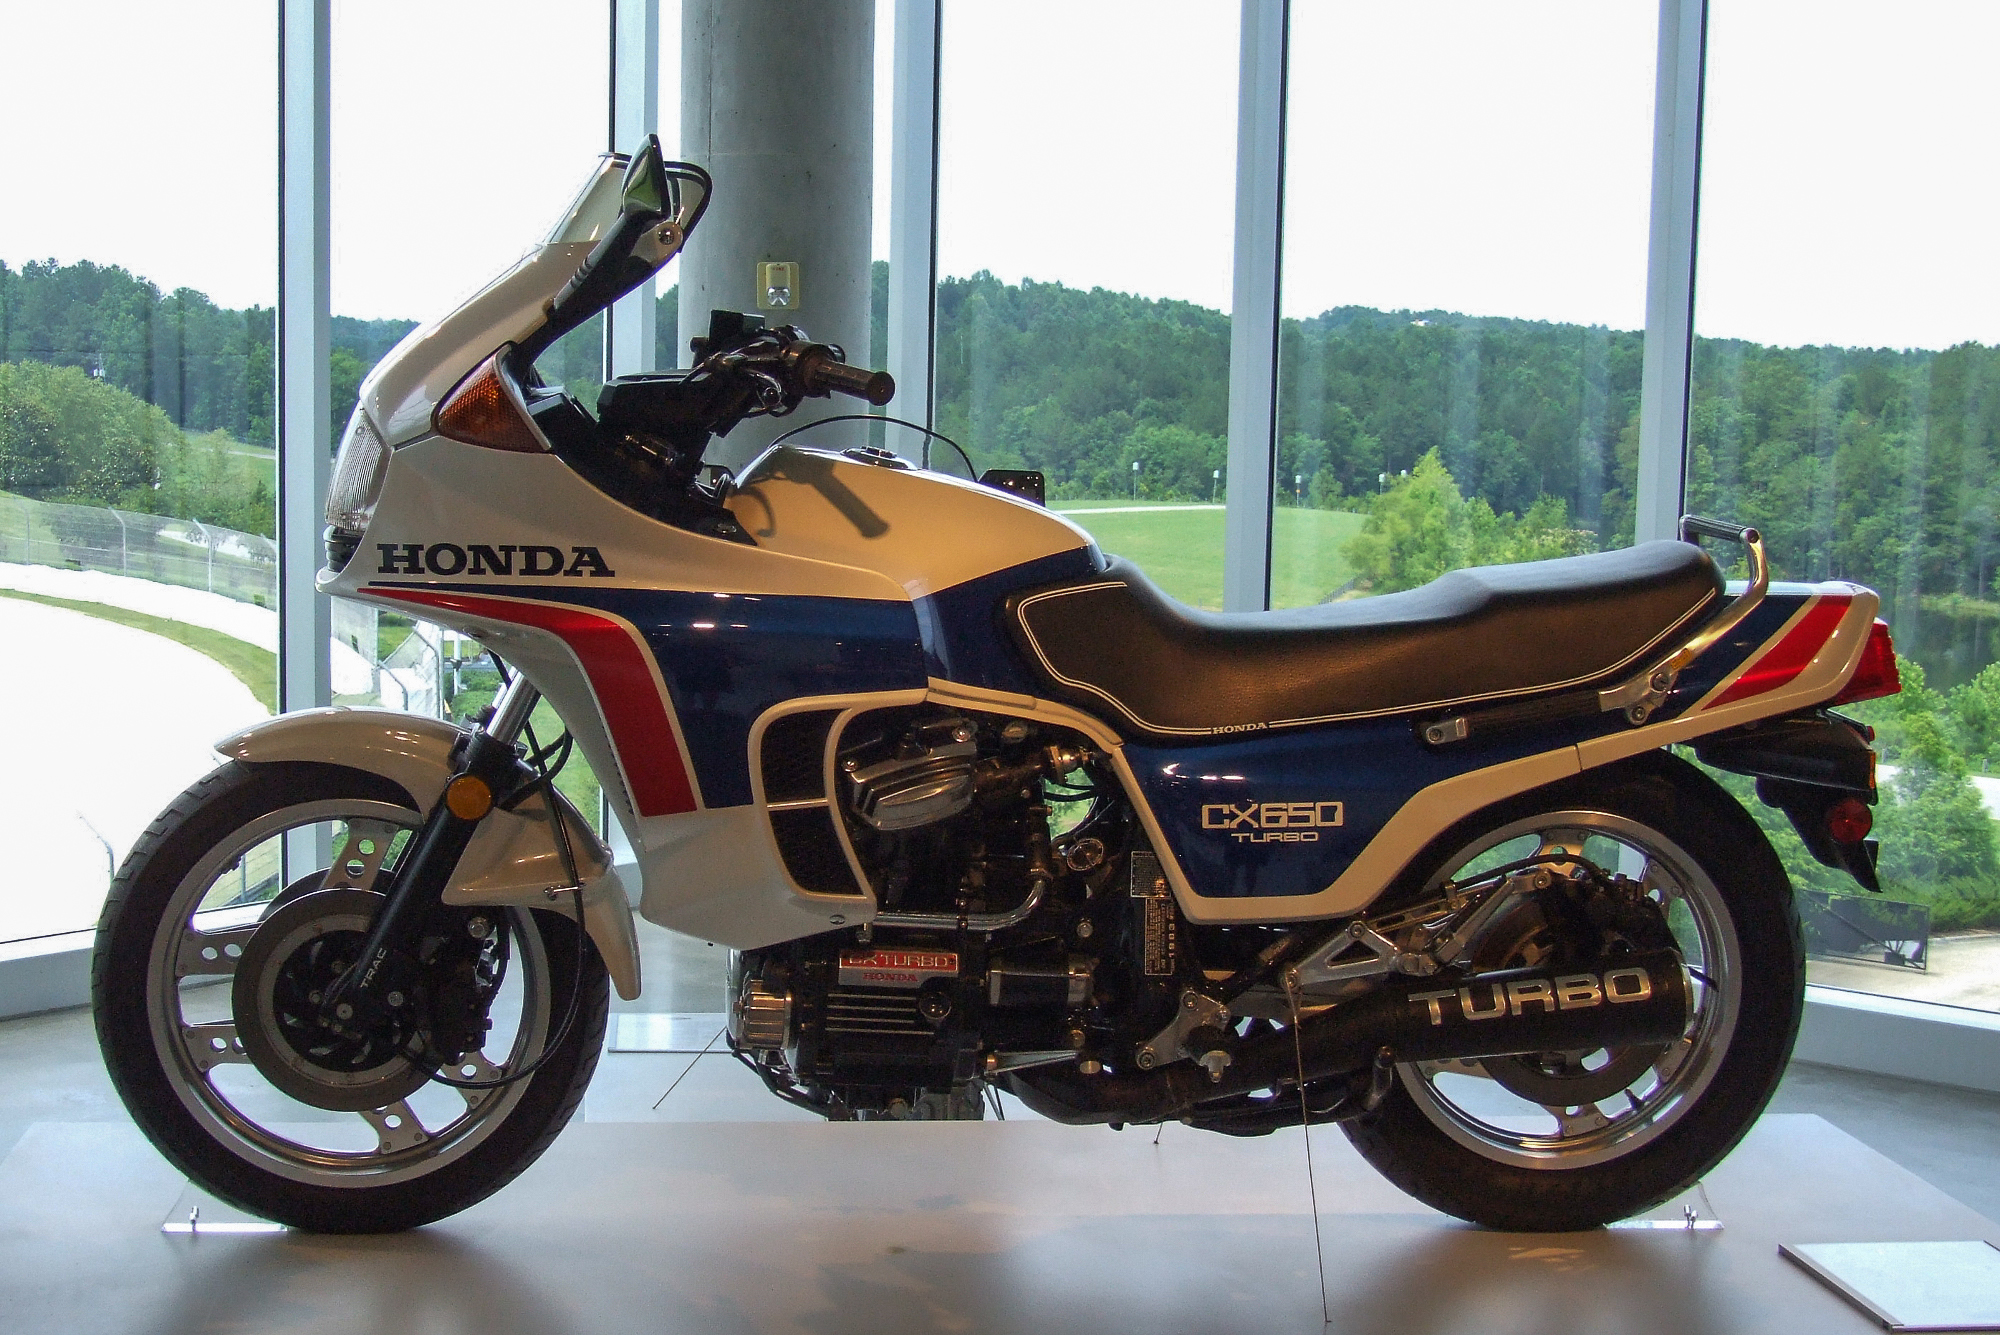 honda cx series wikiwand rh wikiwand com 2001 Honda 400Ex Honda 400 Touring Motorcycles